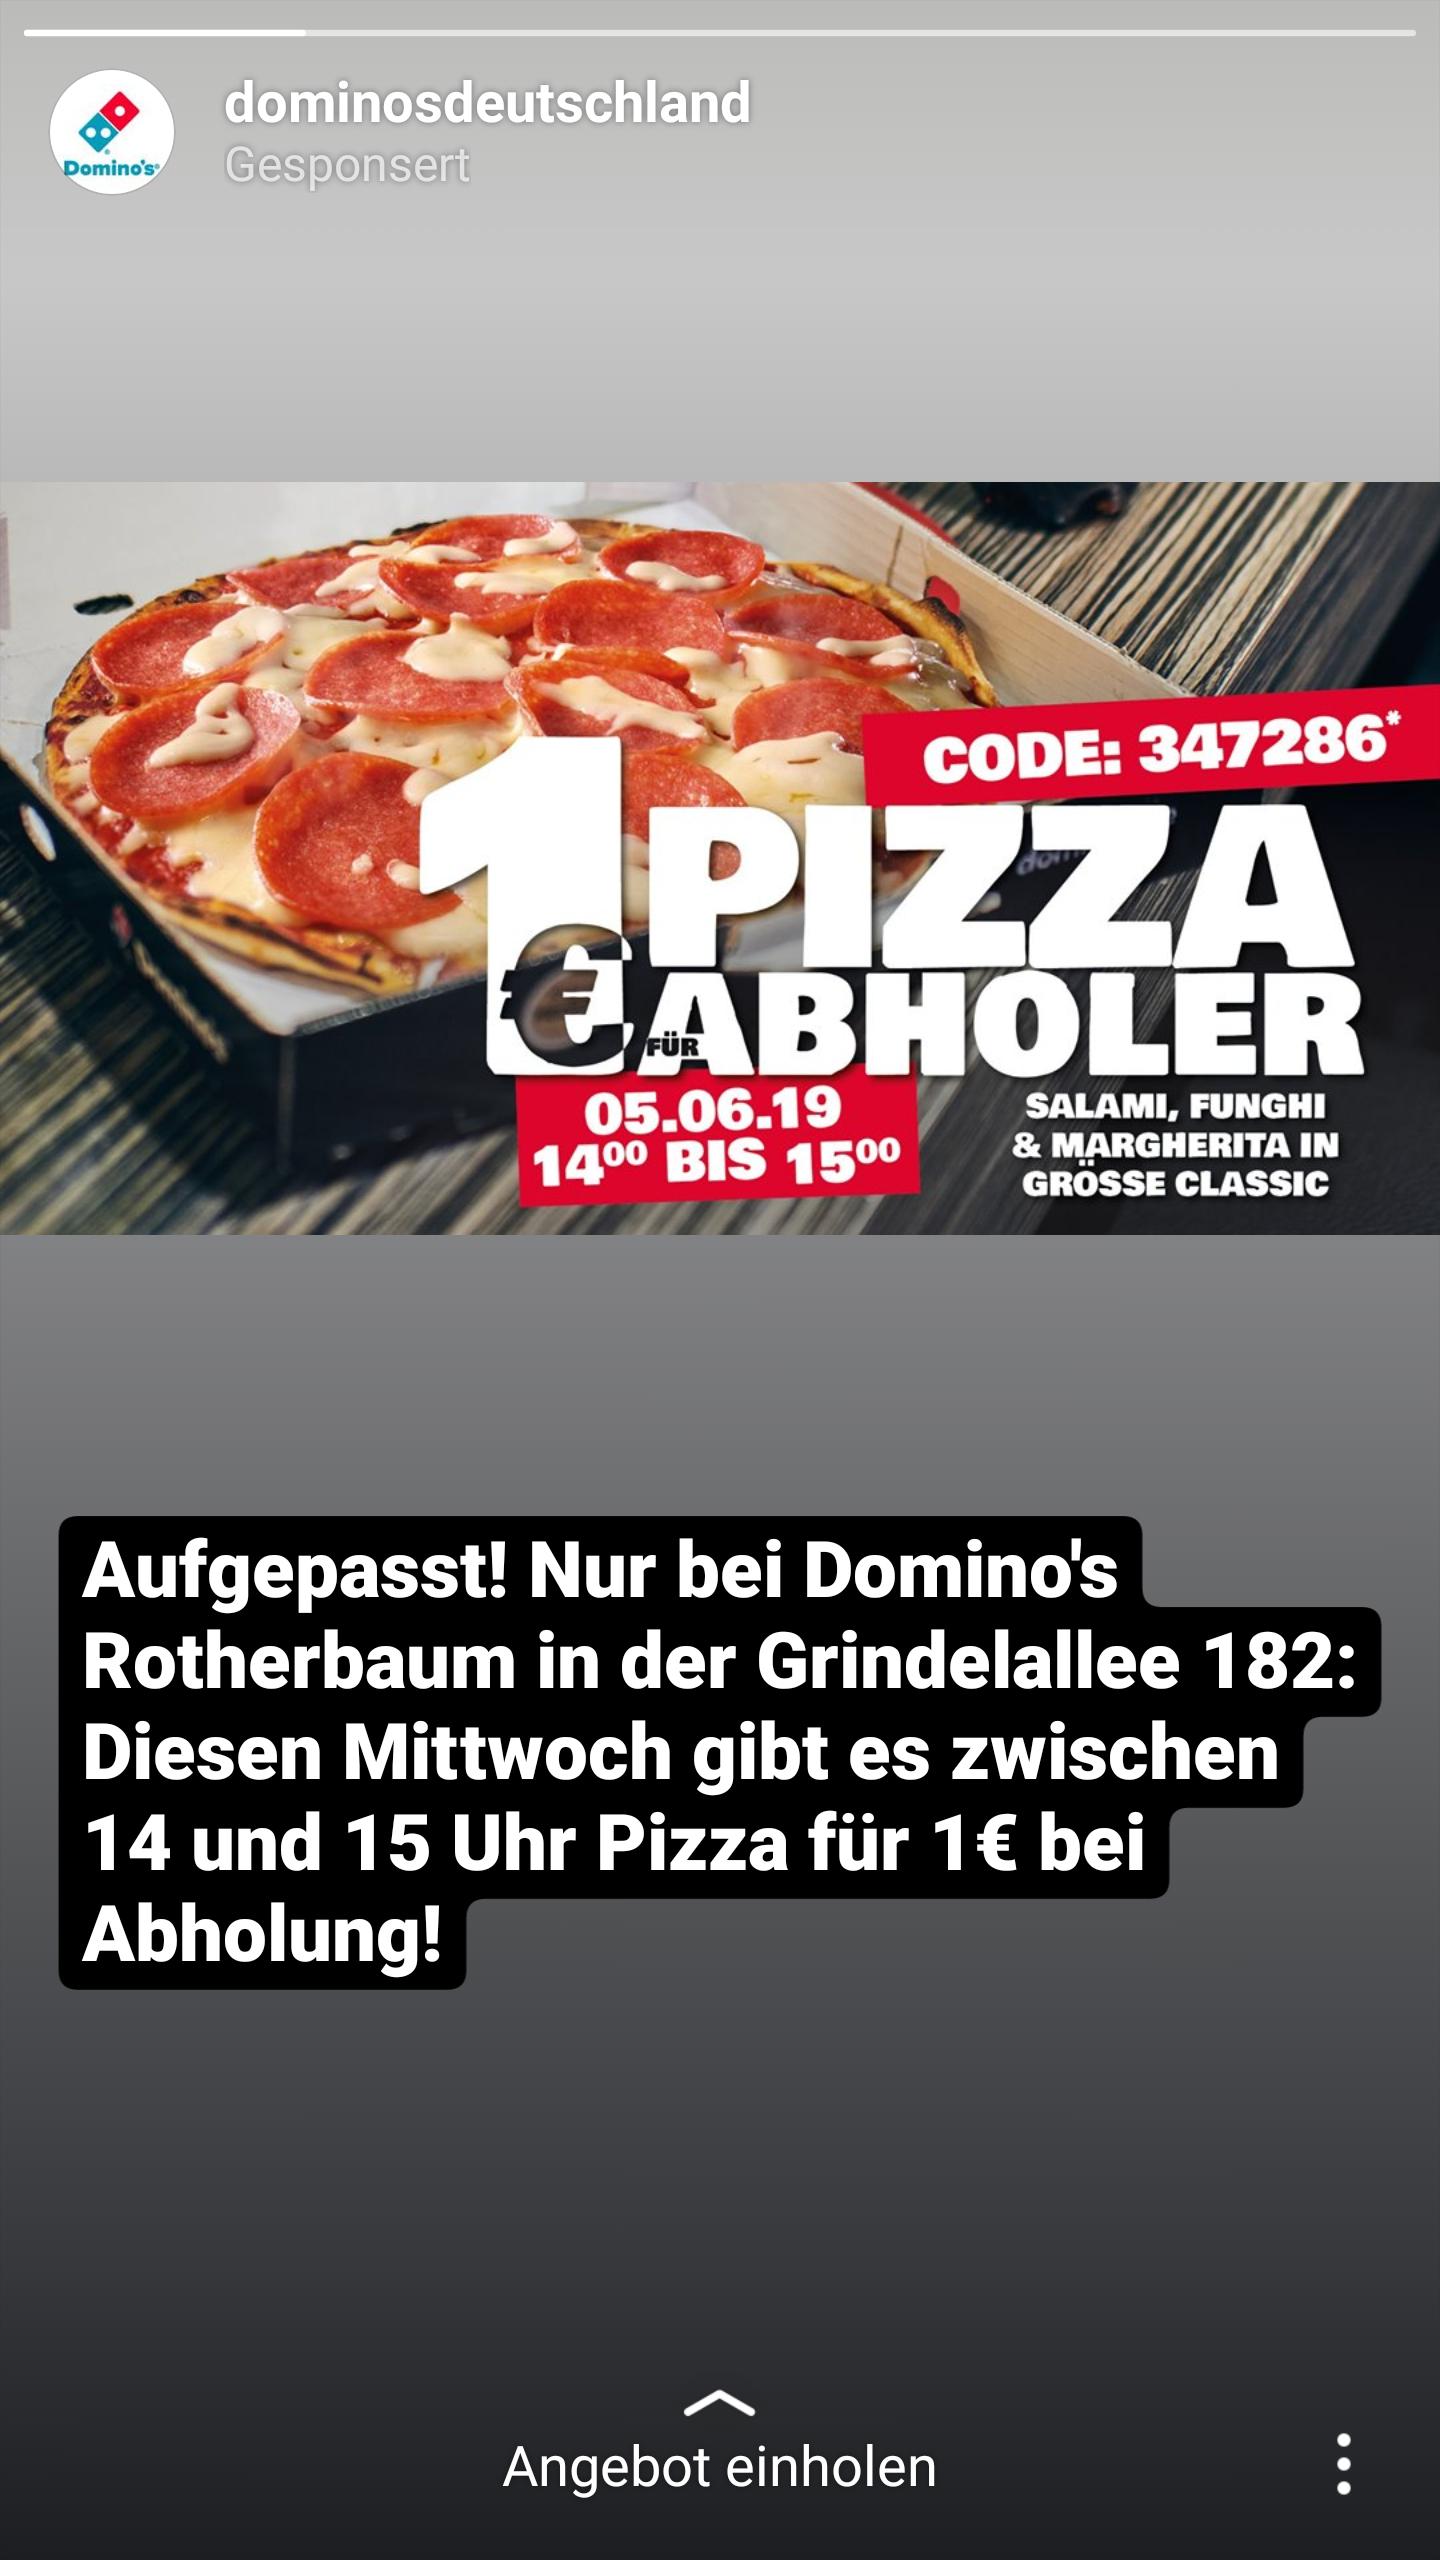 Lokal Hamburg - Grindelallee Dominos Pizza Classic 14-15 Uhr nur 1€